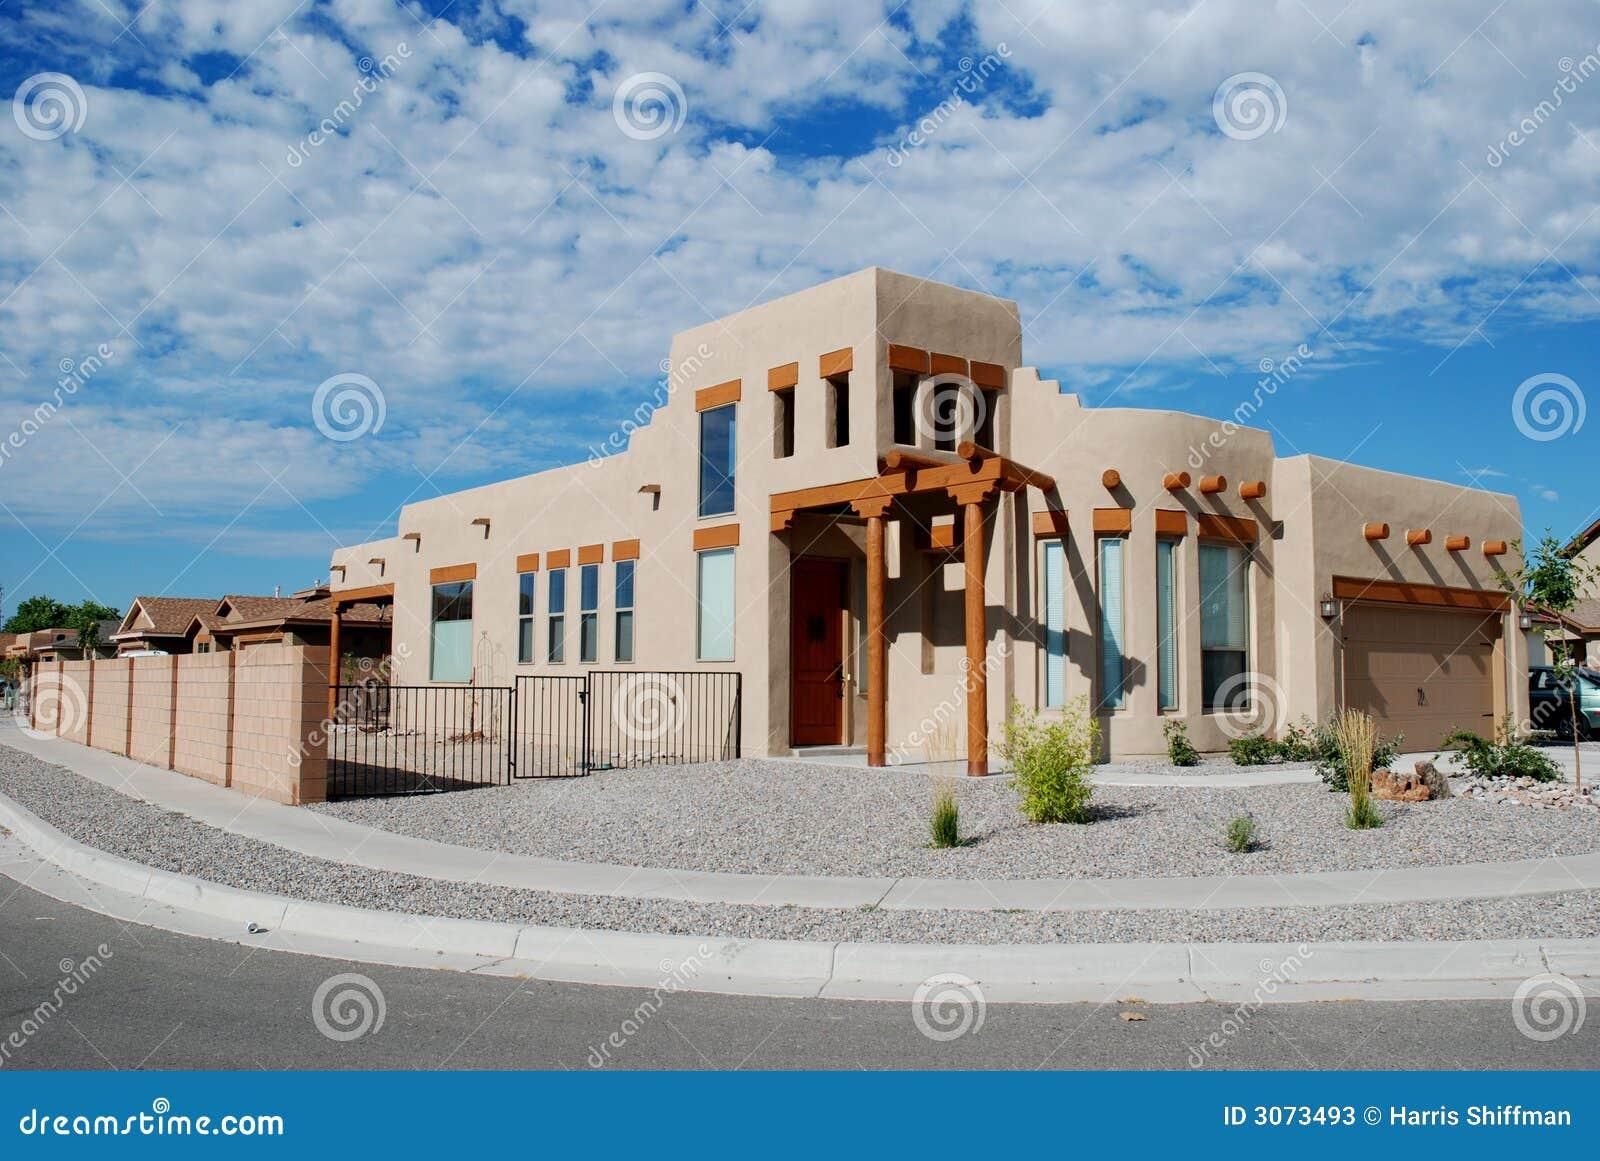 Southwestern Home Stock Photos Image 3073493